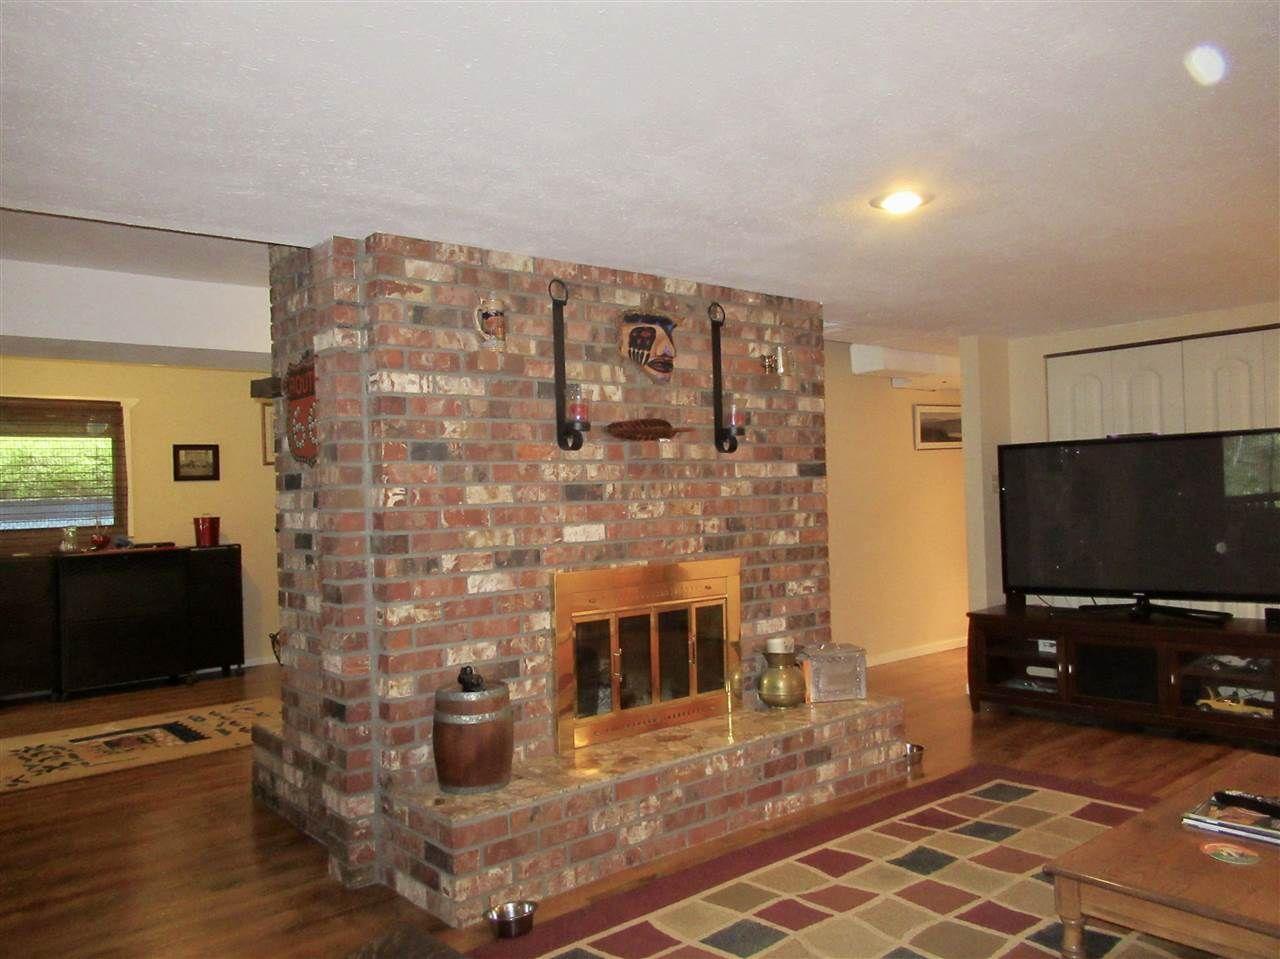 Photo 13: Photos: 911 CENTAUR Drive in Williams Lake: Esler/Dog Creek House for sale (Williams Lake (Zone 27))  : MLS®# R2378444